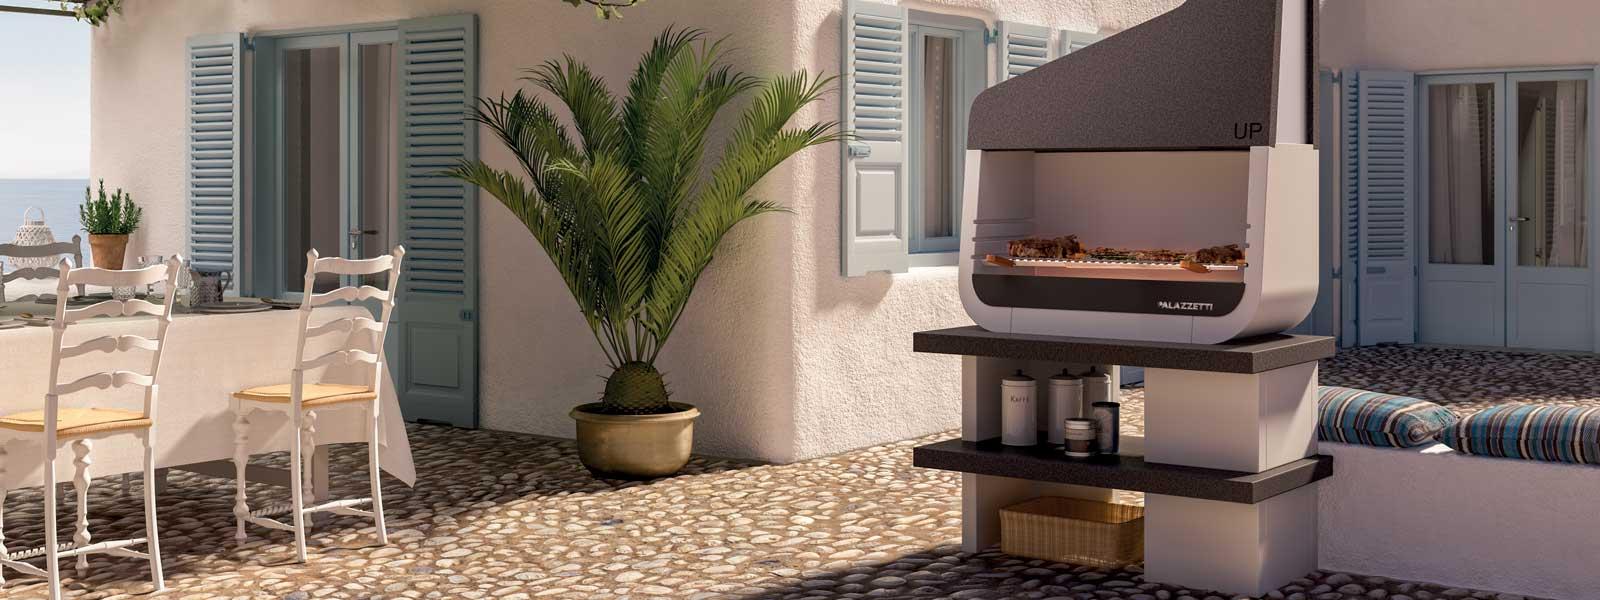 Barbecue Palazzetti a Favara Agrigento